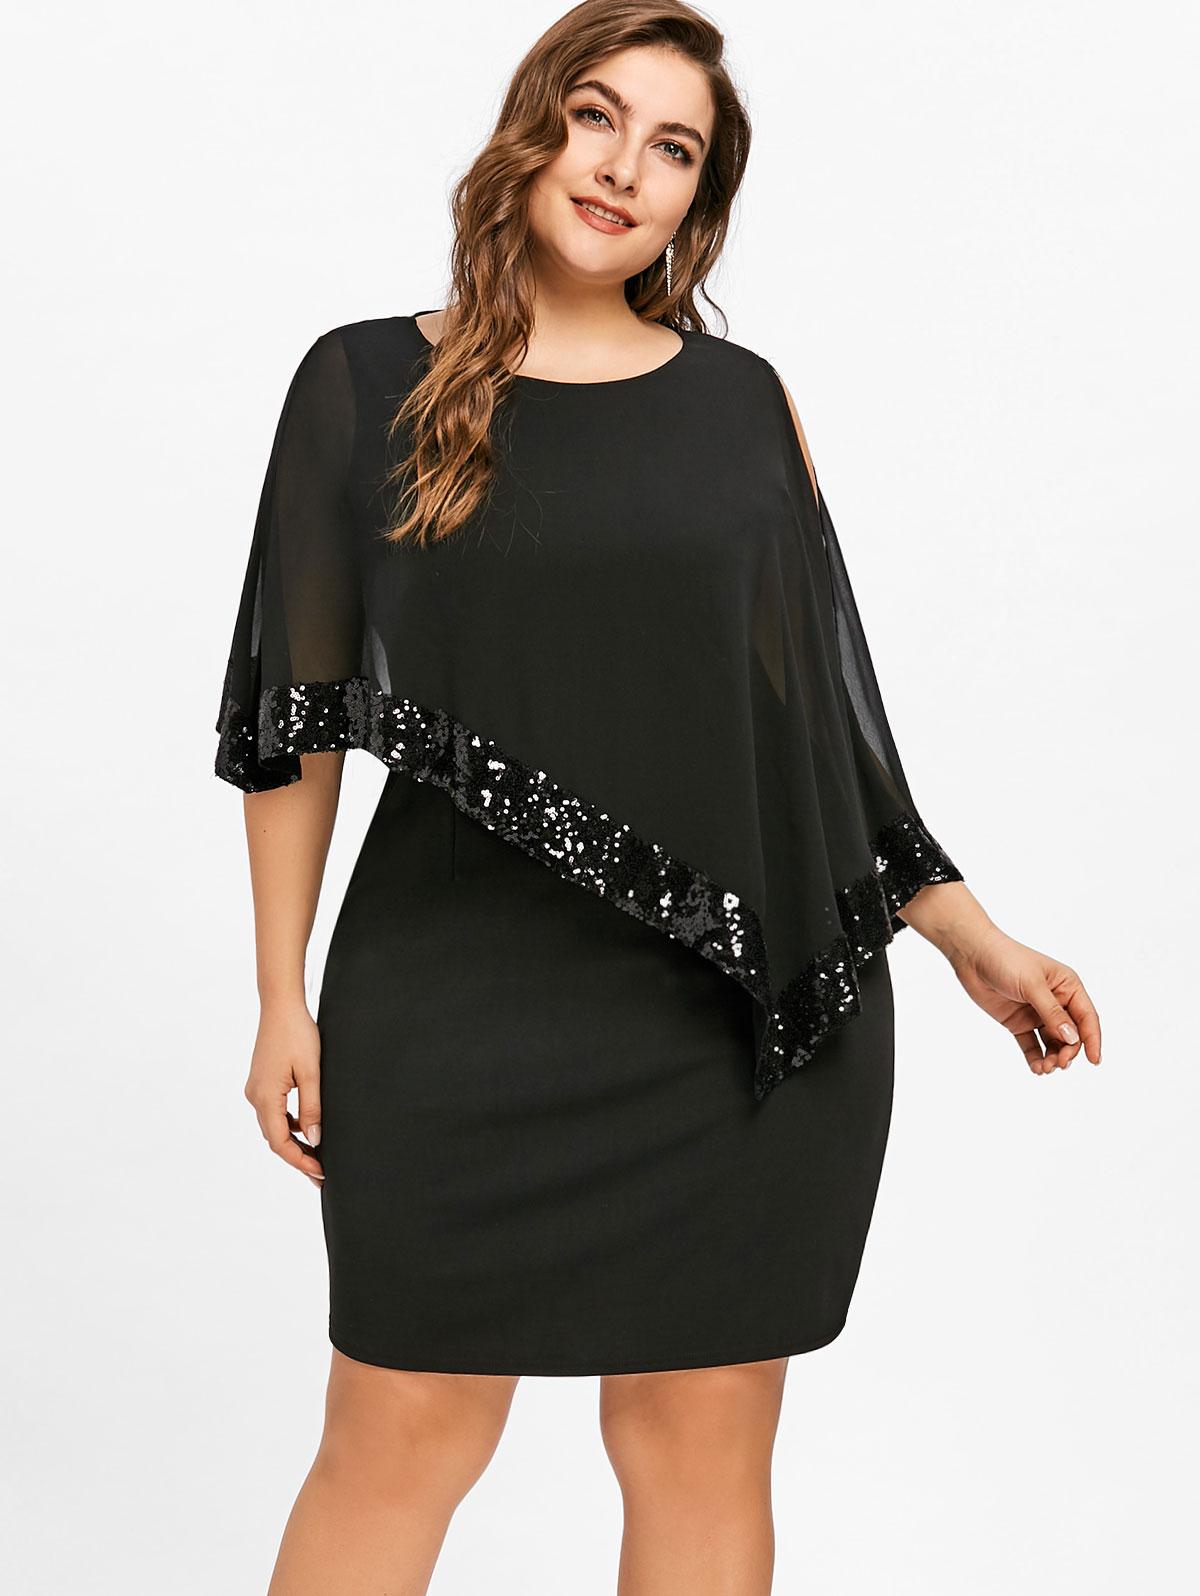 Fashion Dresses Accessories: Gamiss Women Fashion 2018 Summer Plus Size 5XL Sequins